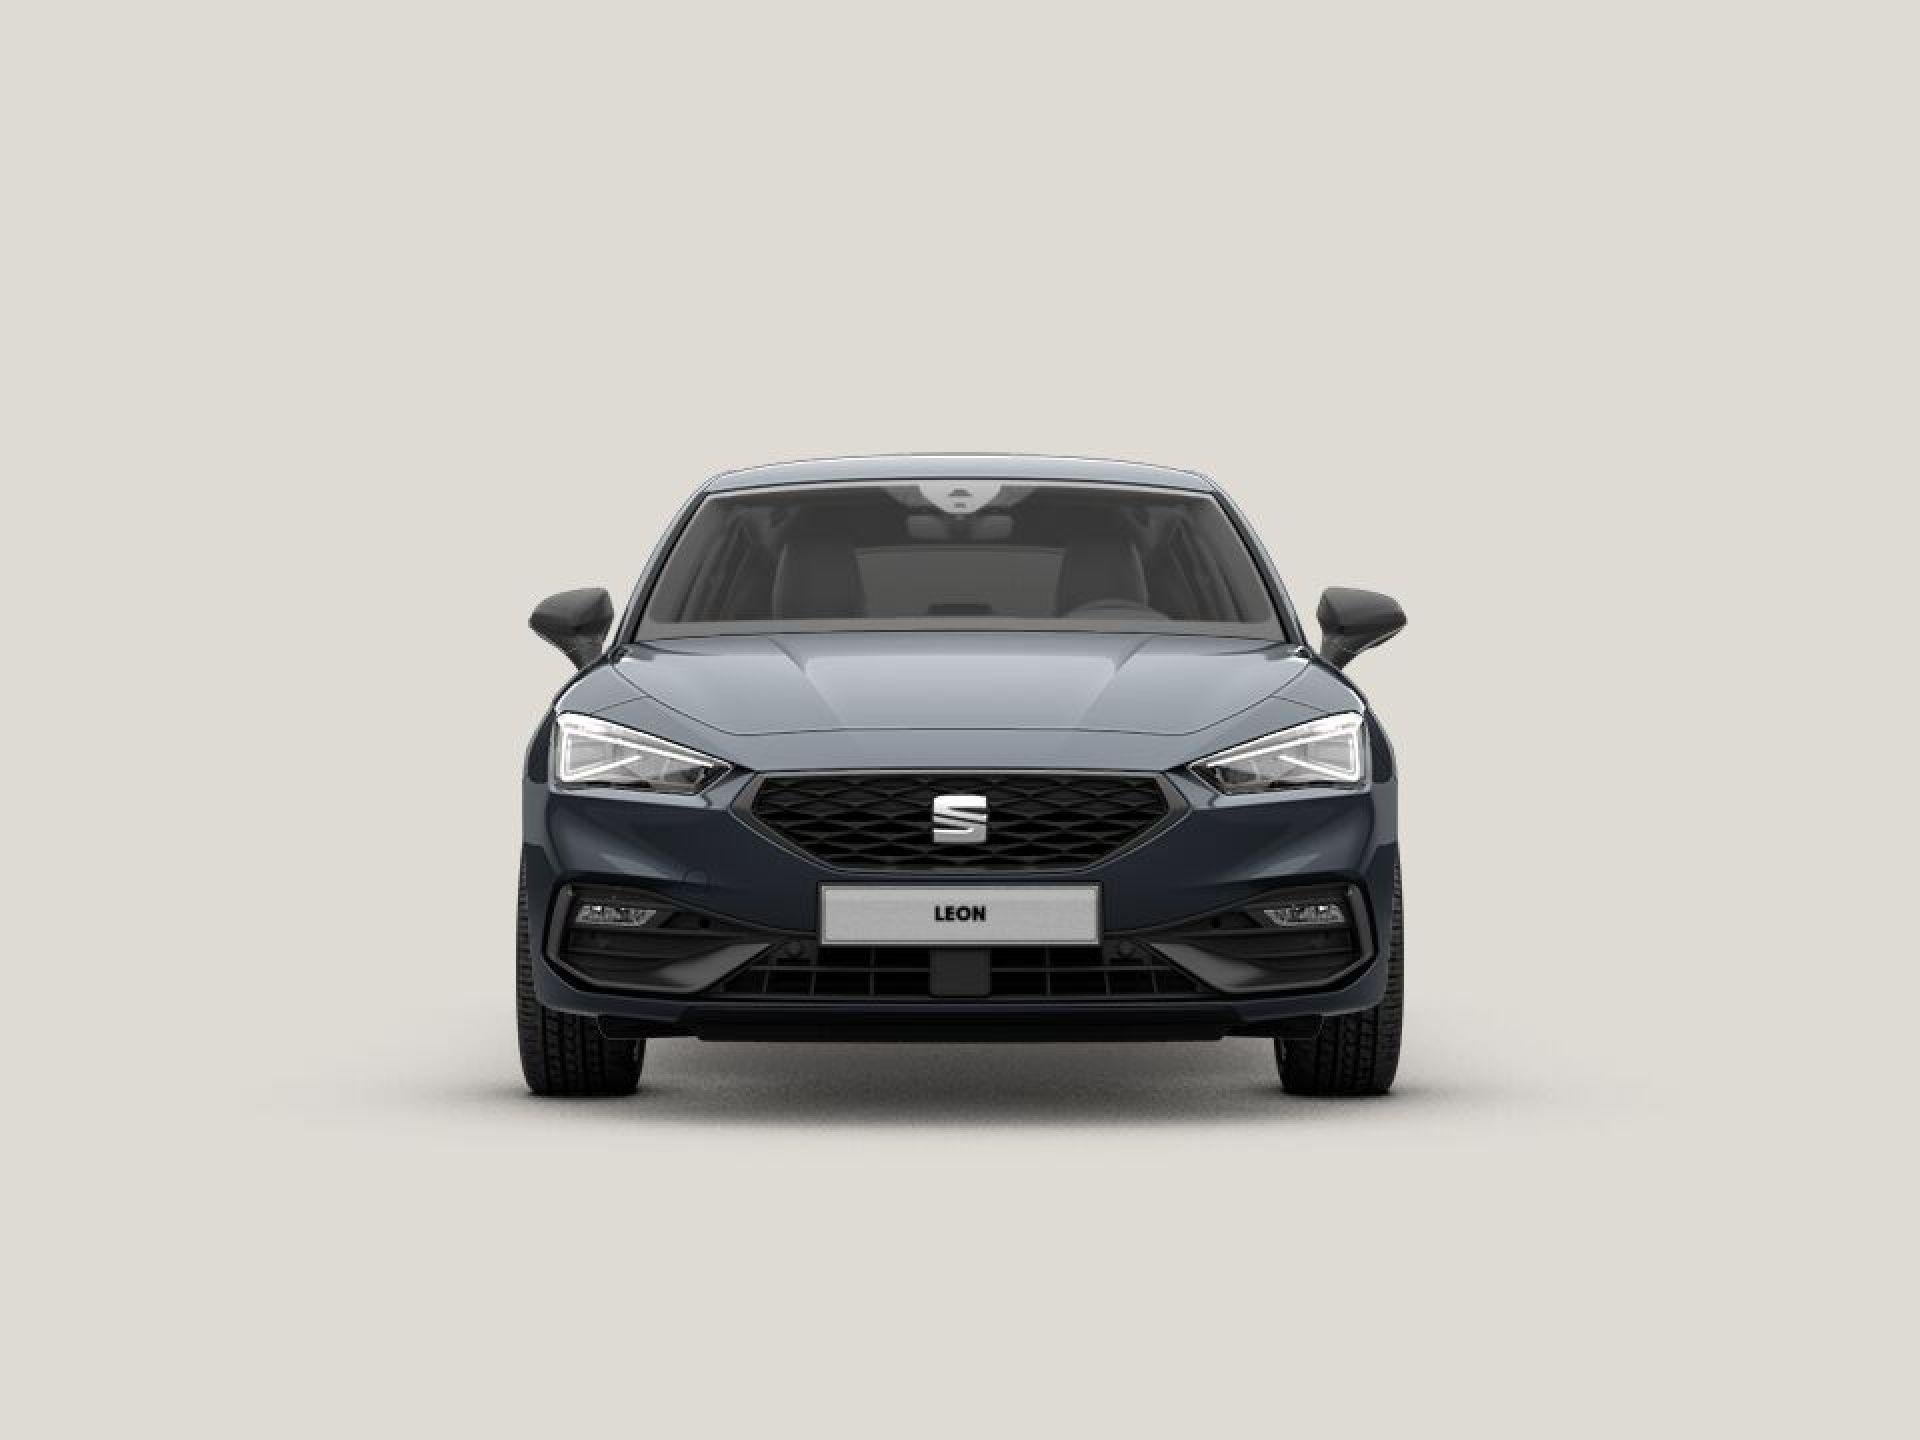 SEAT Nuevo León 2.0 TDI 110kW DSG-7 S&S FR Launch P L nuevo Madrid